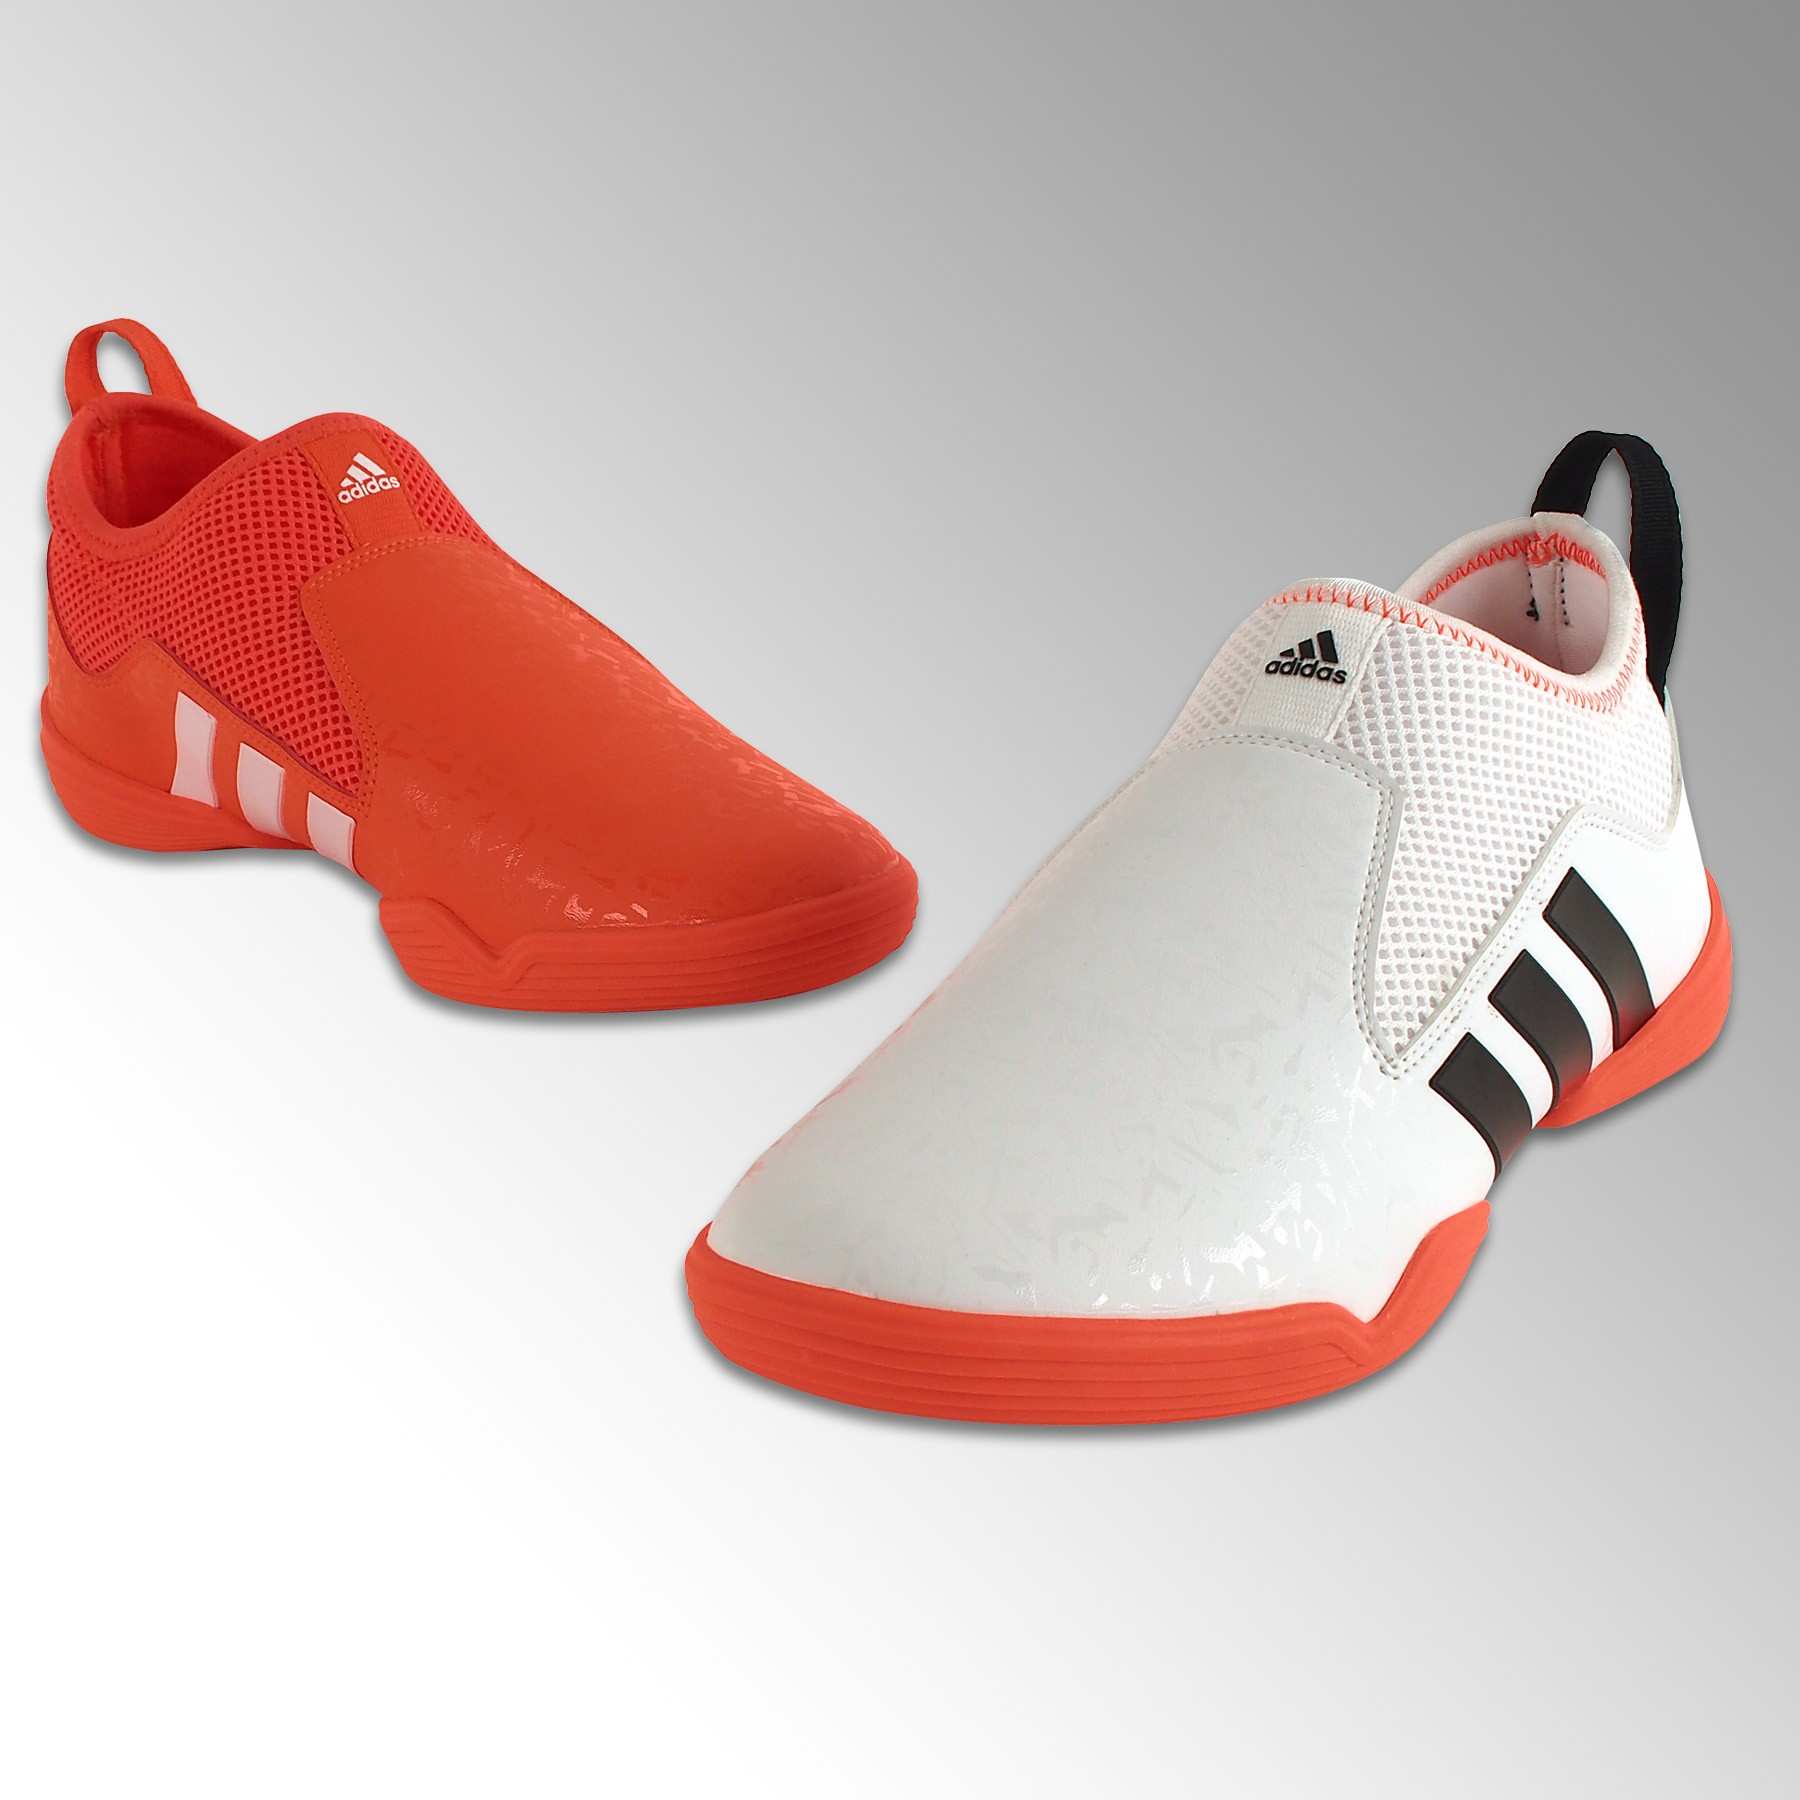 chaussure taekwondo nike,chaussure tkd nike